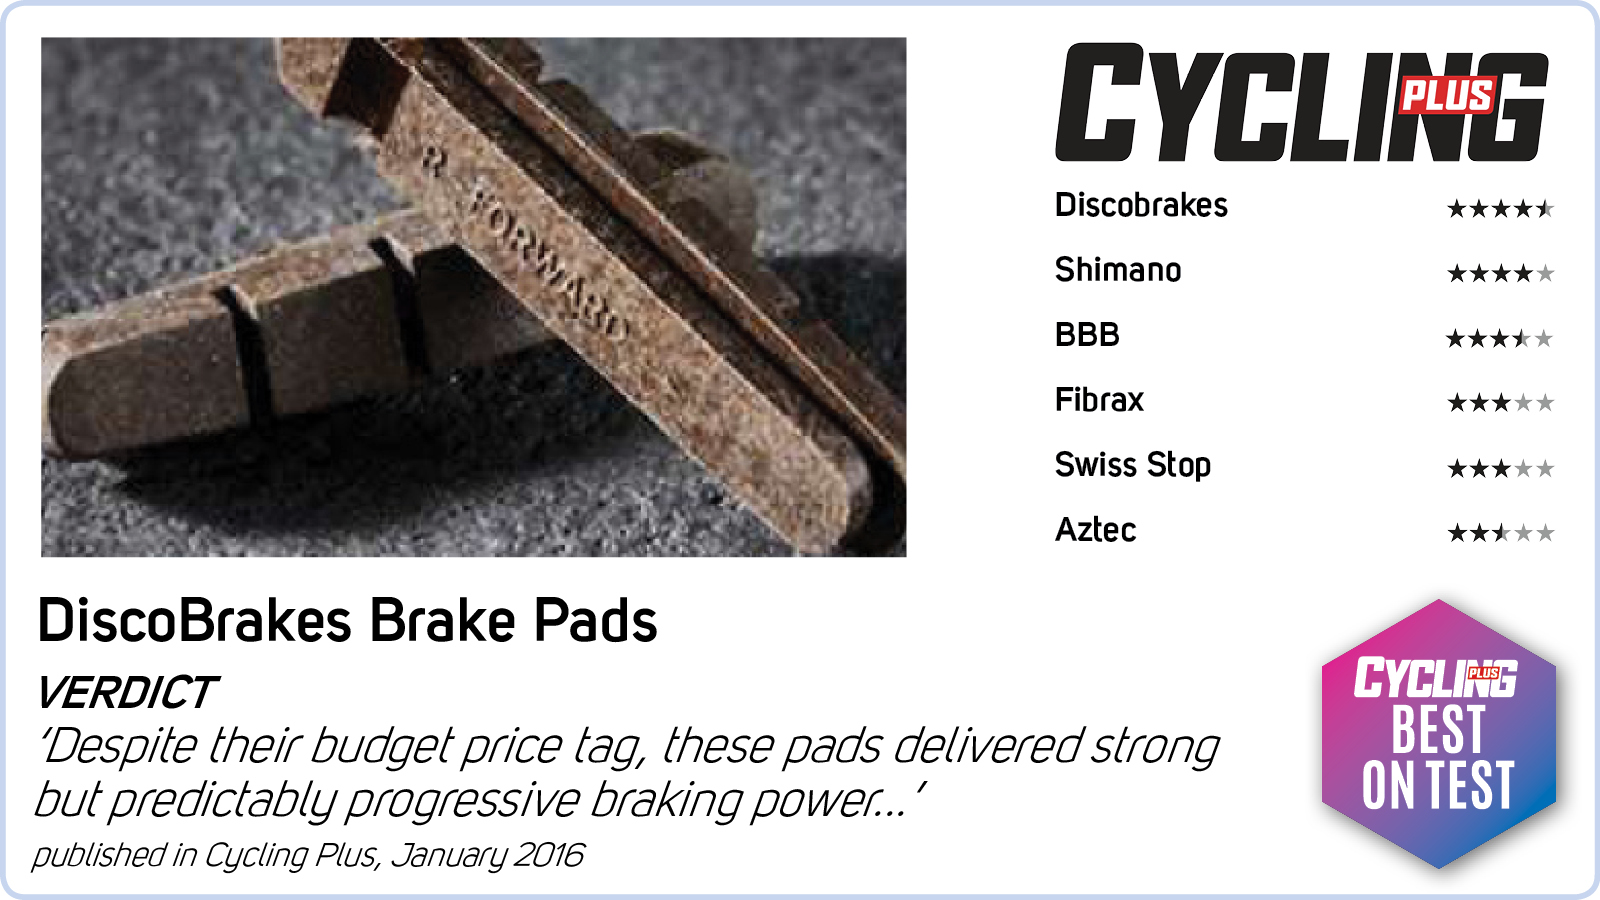 4-Pairs-8Pads-Sintered-Disc-Brake-Pads-for-Avid-Code-Long-Life-MTB-DH-XC-Enduro